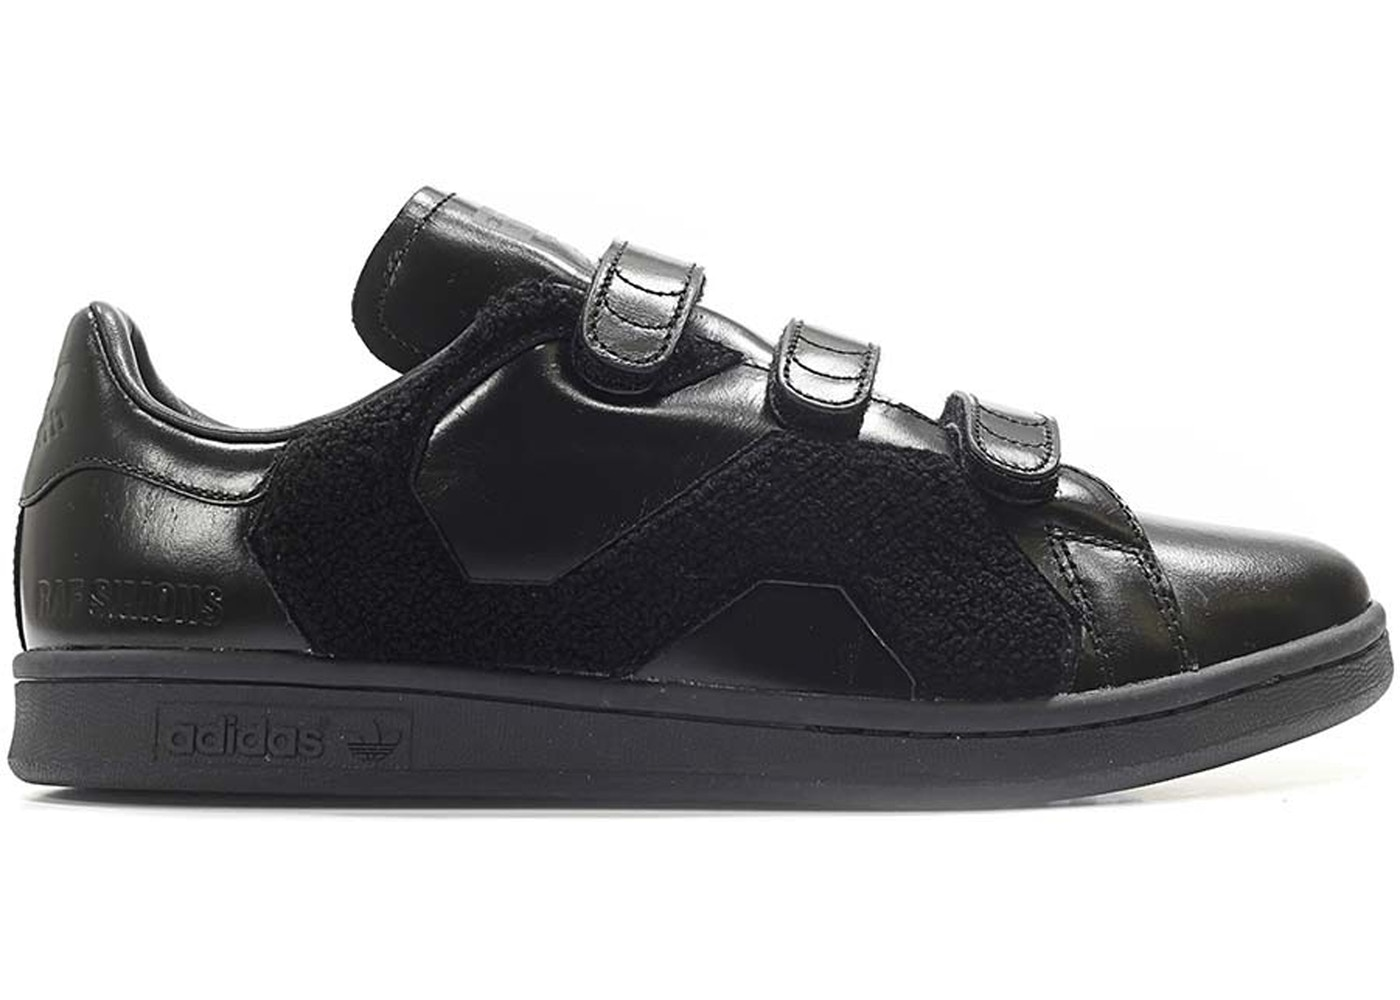 online store 534f0 28f55 adidas Stan Smith Raf Simons Comfort Badge Black